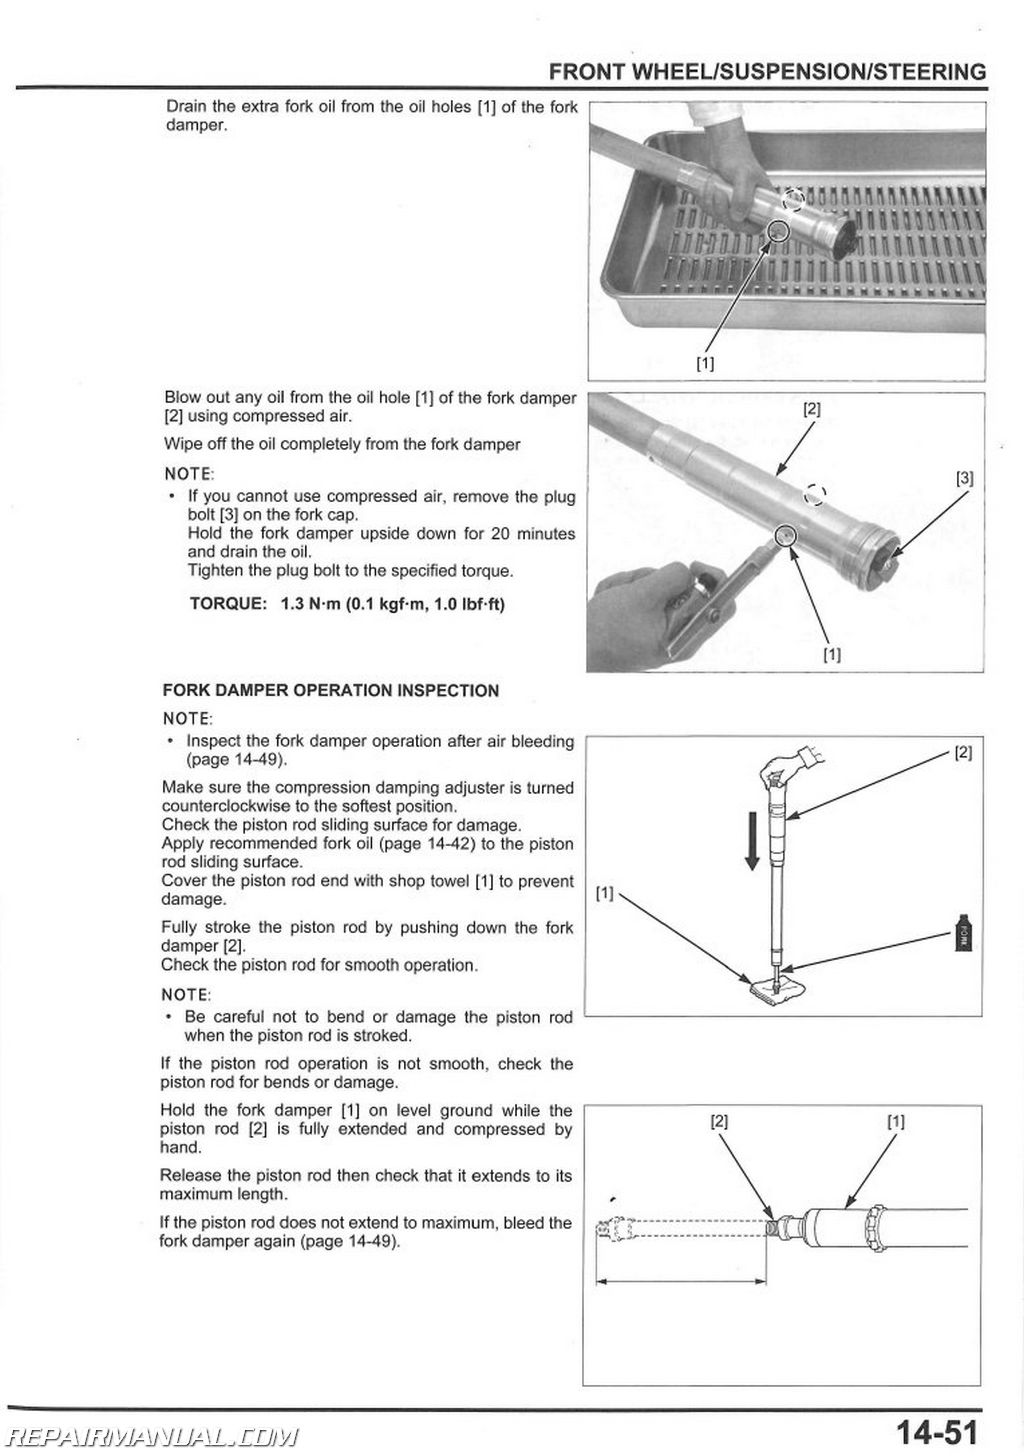 stihl ms 270 parts diagram 4 wire trailer lights way flat connector free engine image husqvarna carburetor throttle linkage